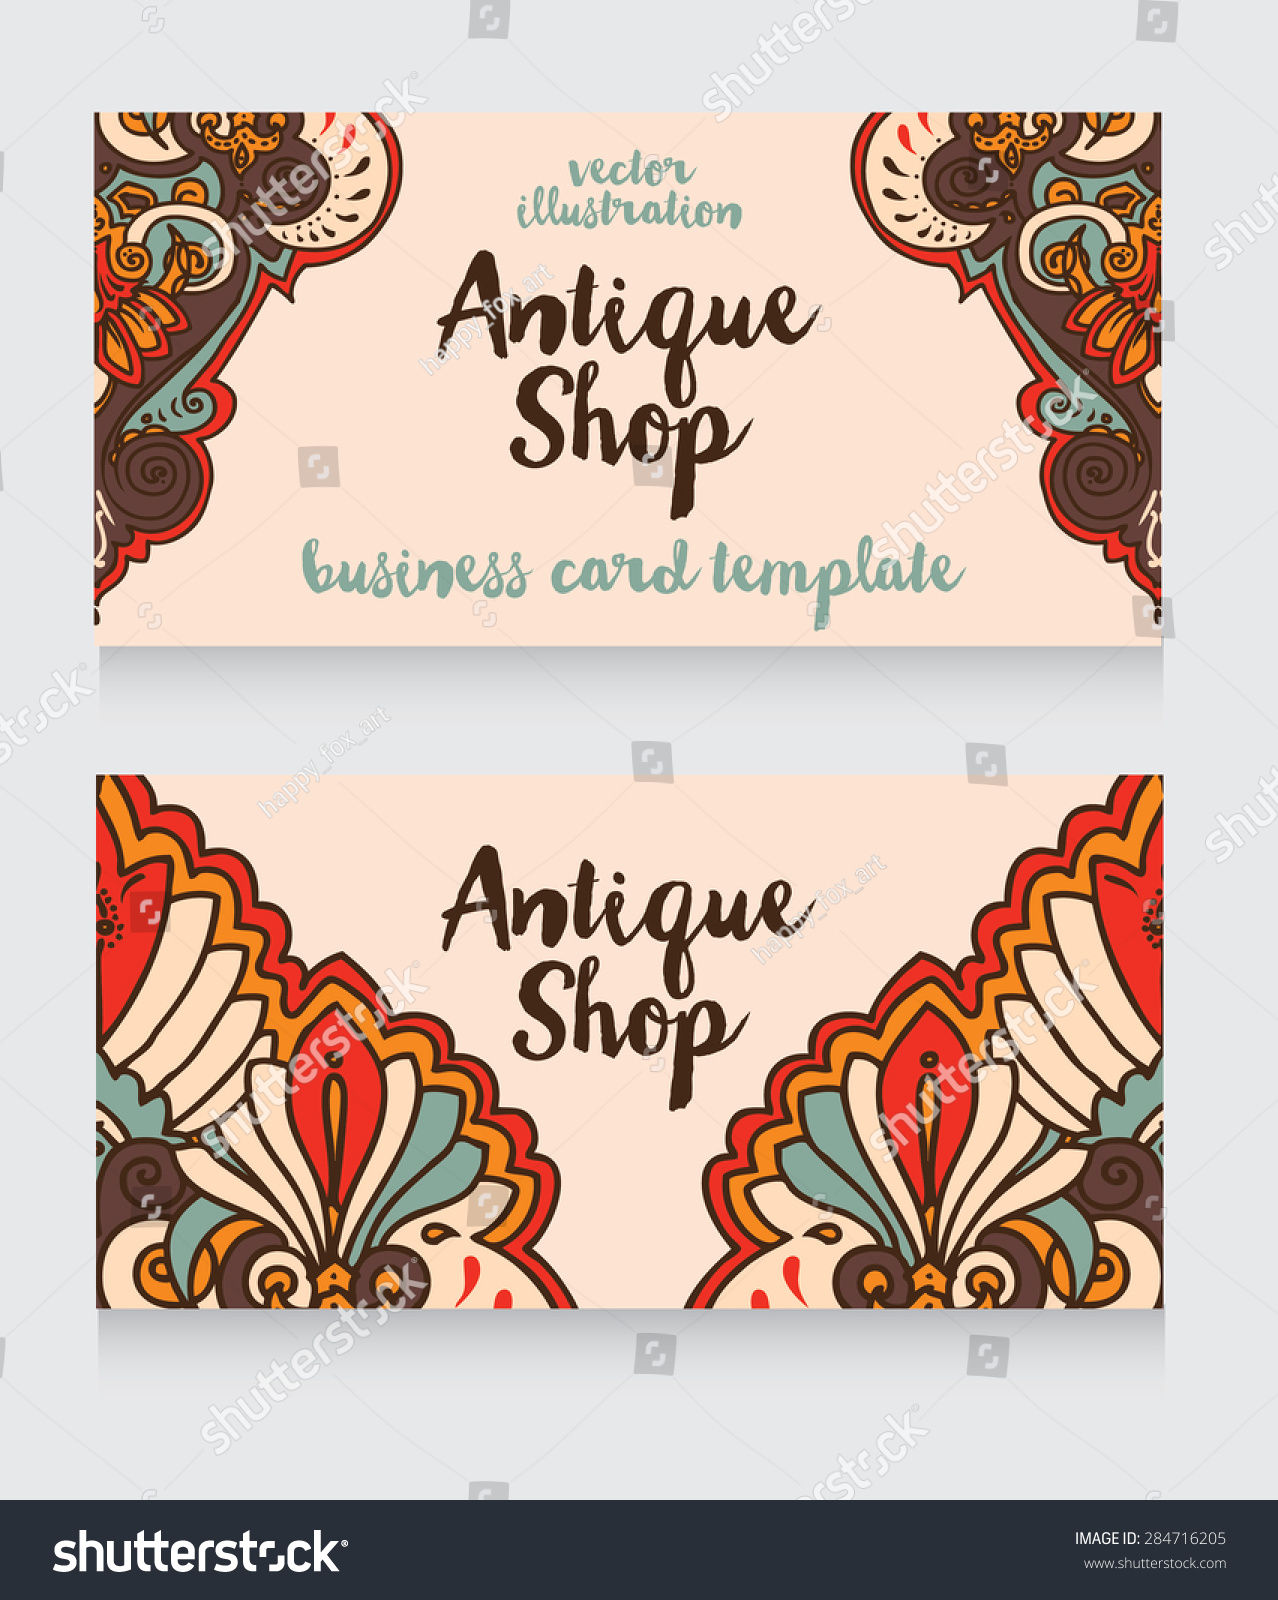 Business Cards Template Antique Shop Arabian Stock Vector (2018 ...